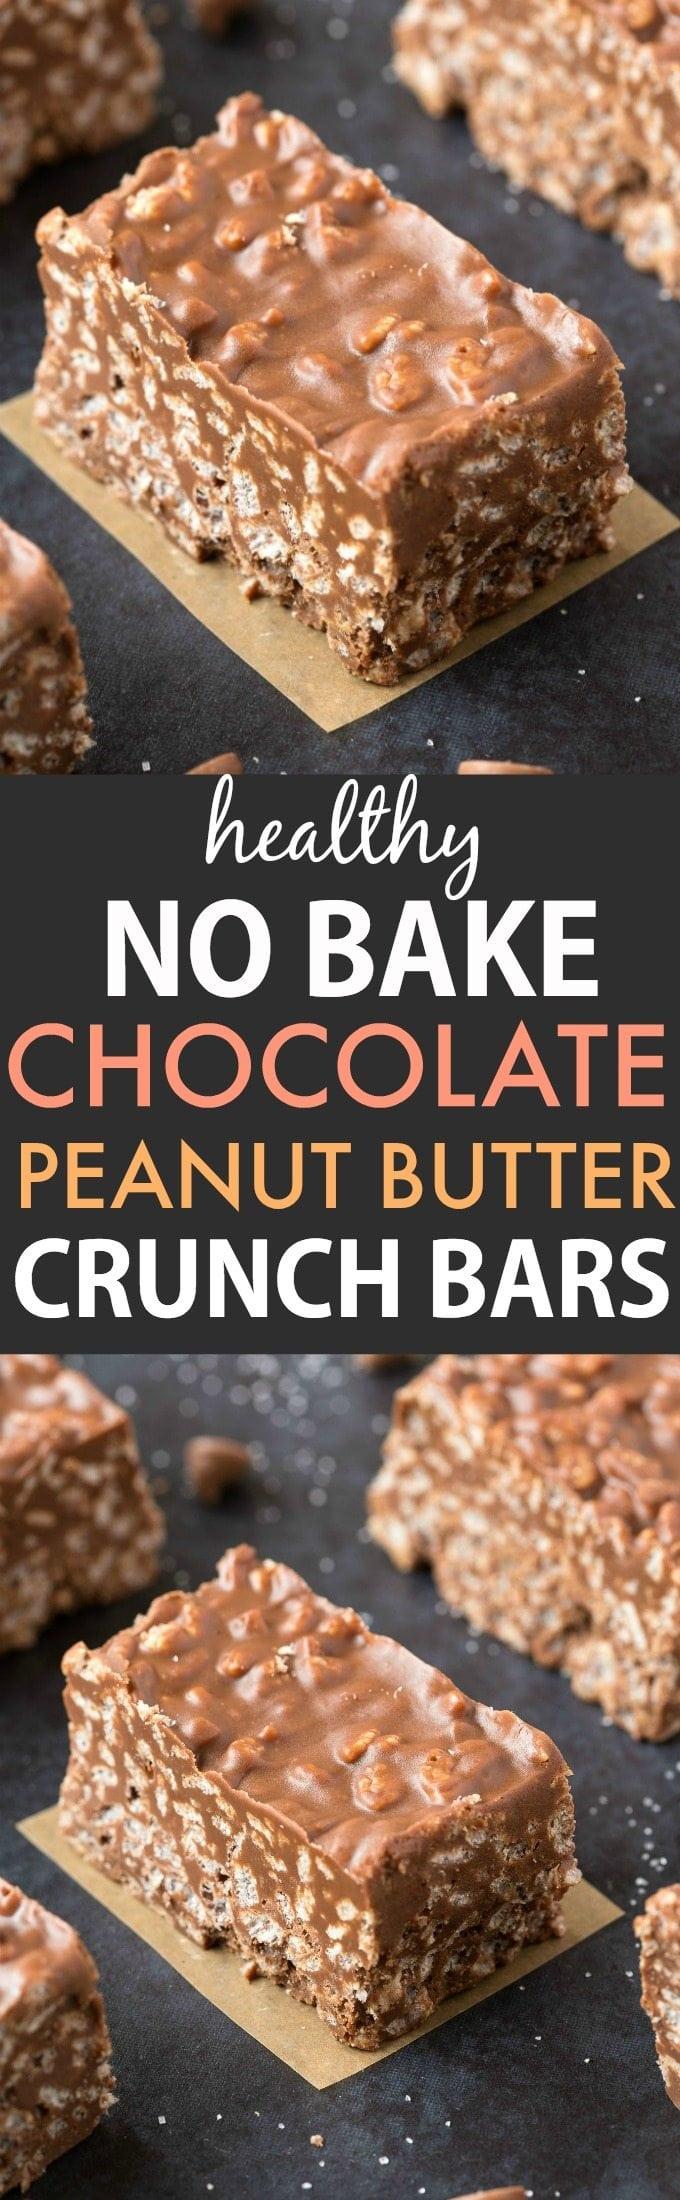 Healthy No Bake Chocolate Peanut Butter Crunch Bars Vegan